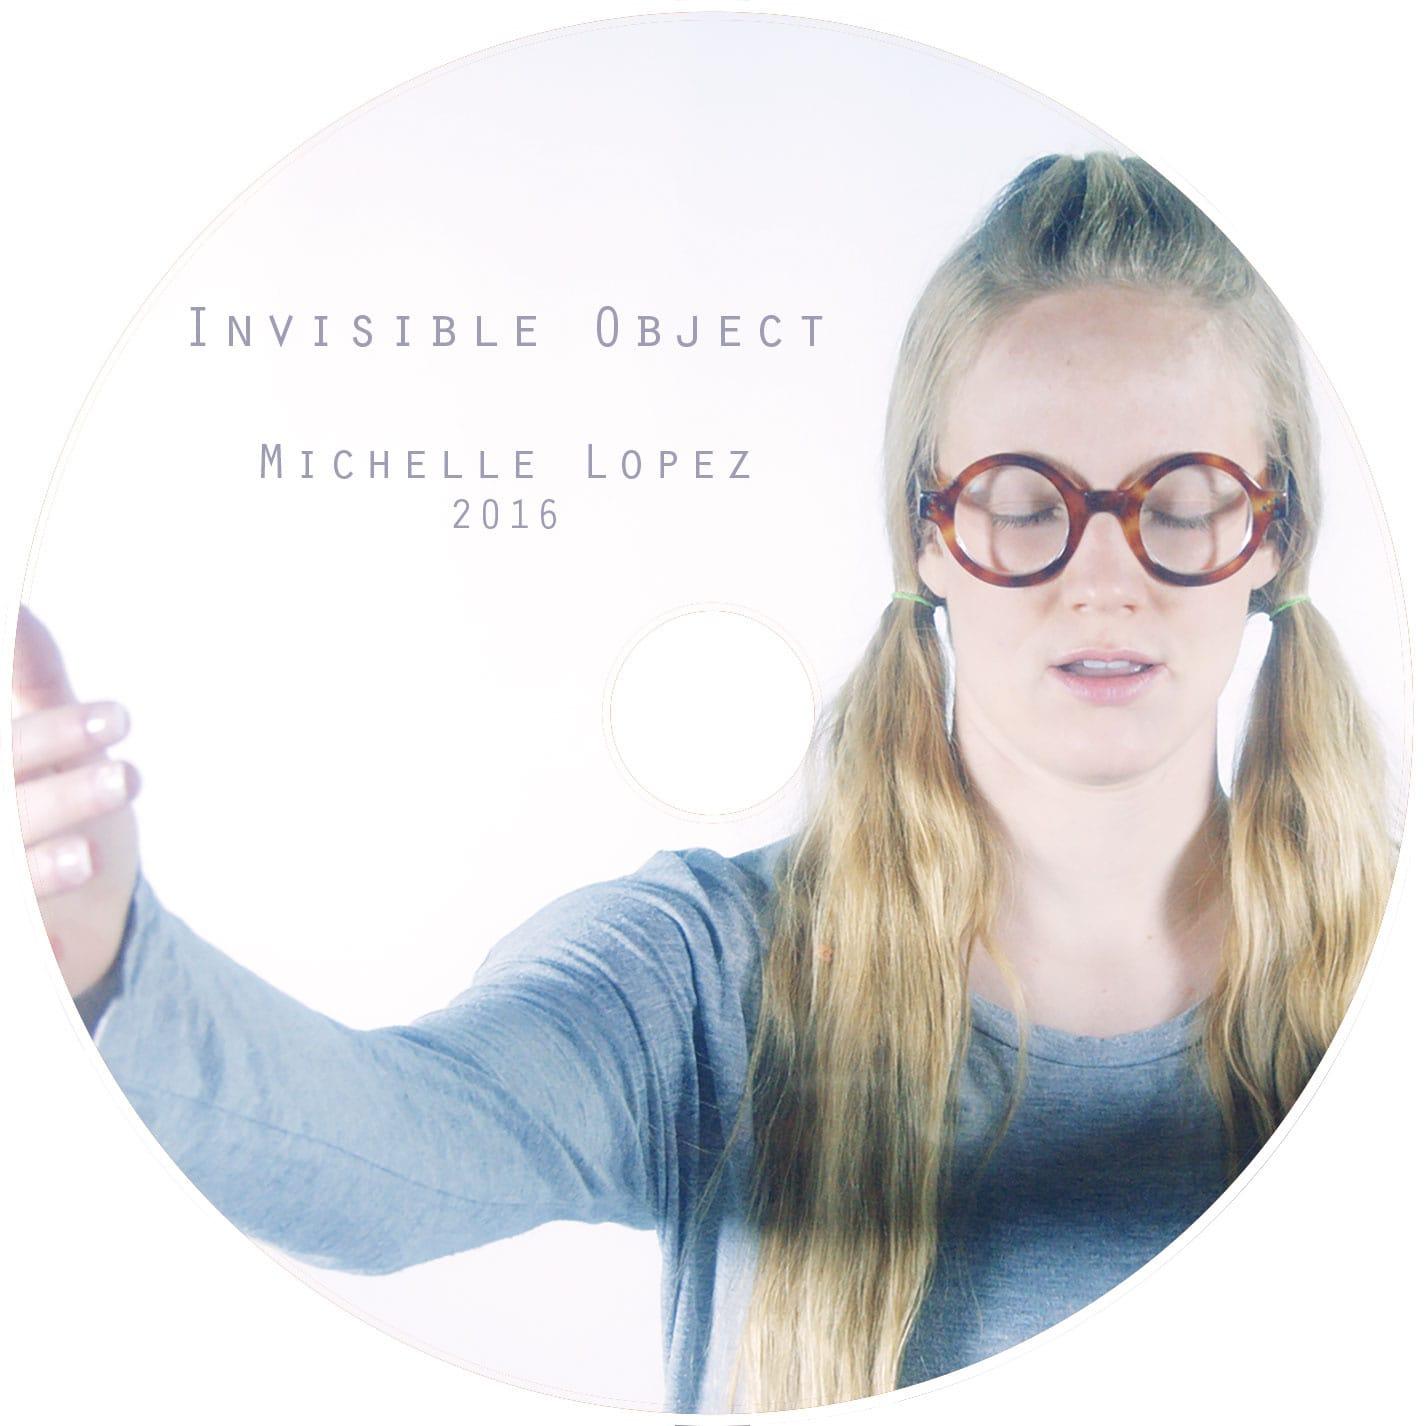 Michelle Lopez, Invisible Object, 2016